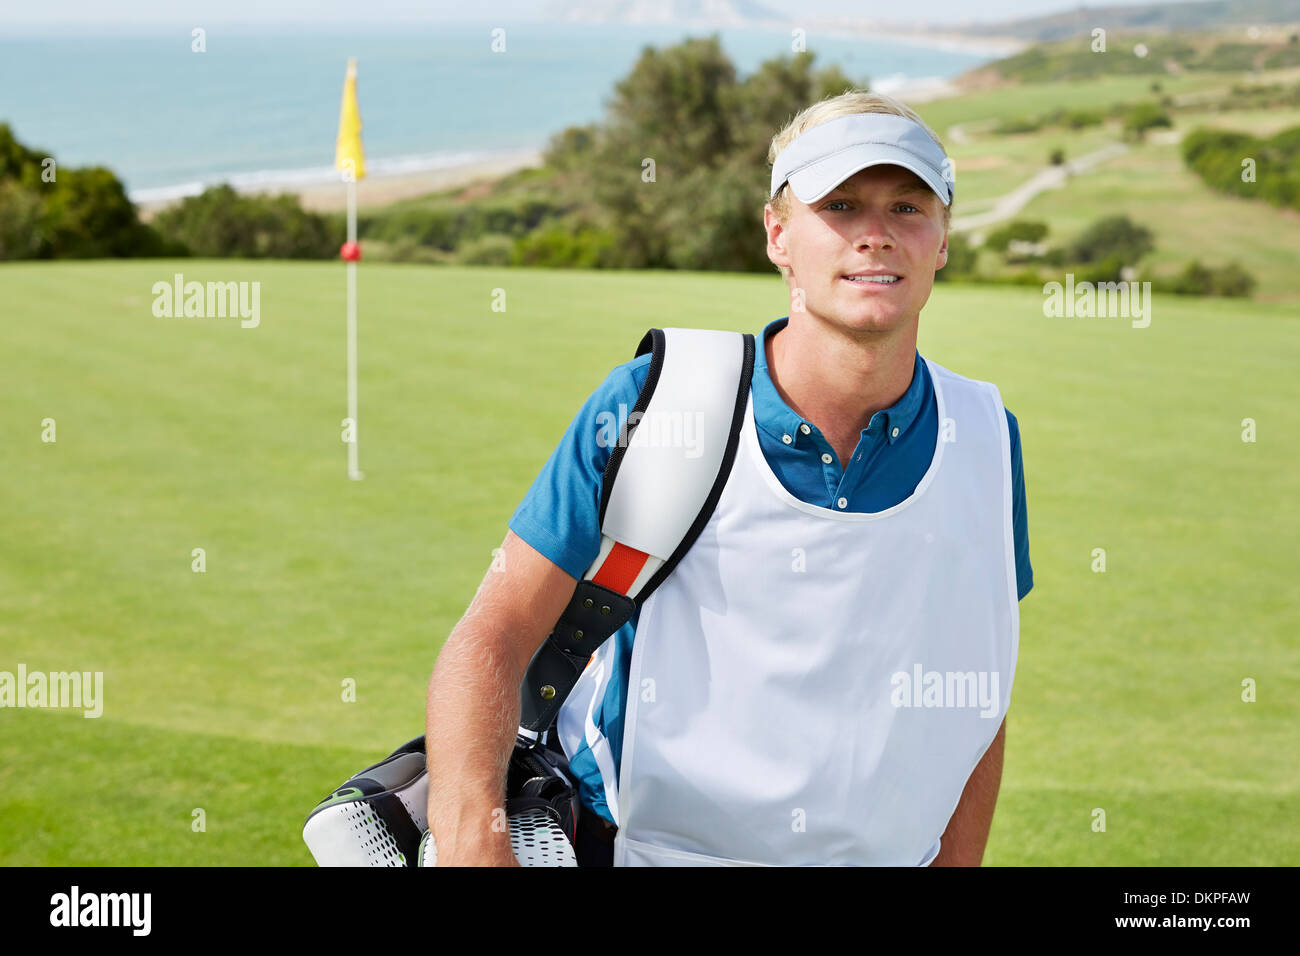 Caddy lächelnd auf Golfplatz Stockbild